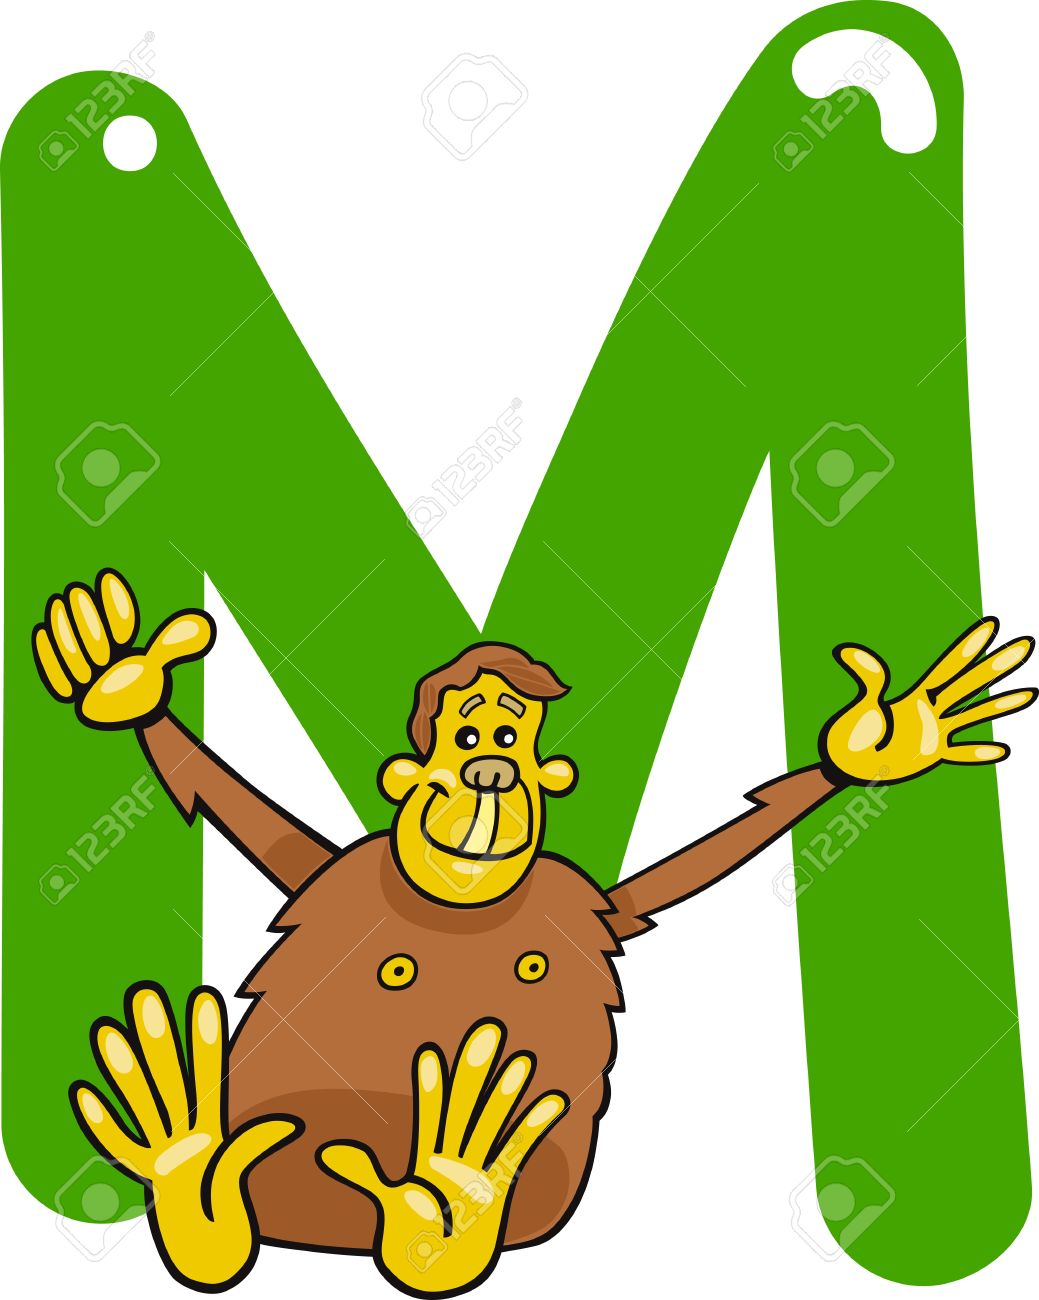 hight resolution of cartoon illustration of m letter for monkey stock vector 13070813